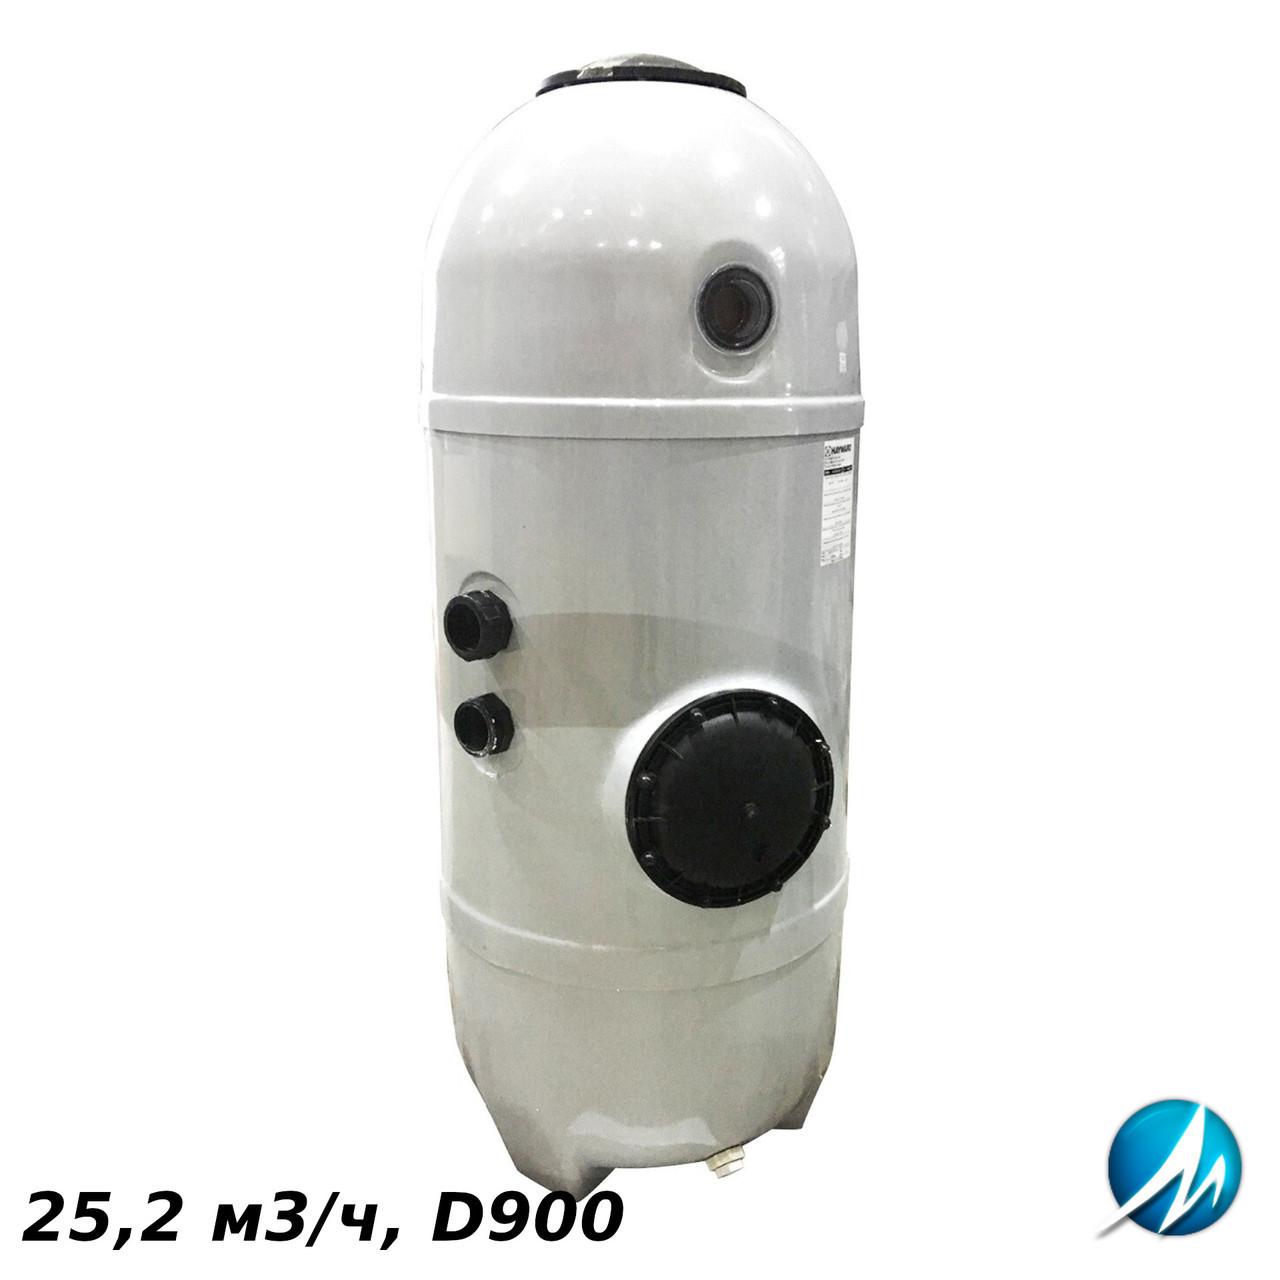 Фільтр Hayward HCFD352I2LVA San Sebastian SBL900 (25,2 м3/год, D900)